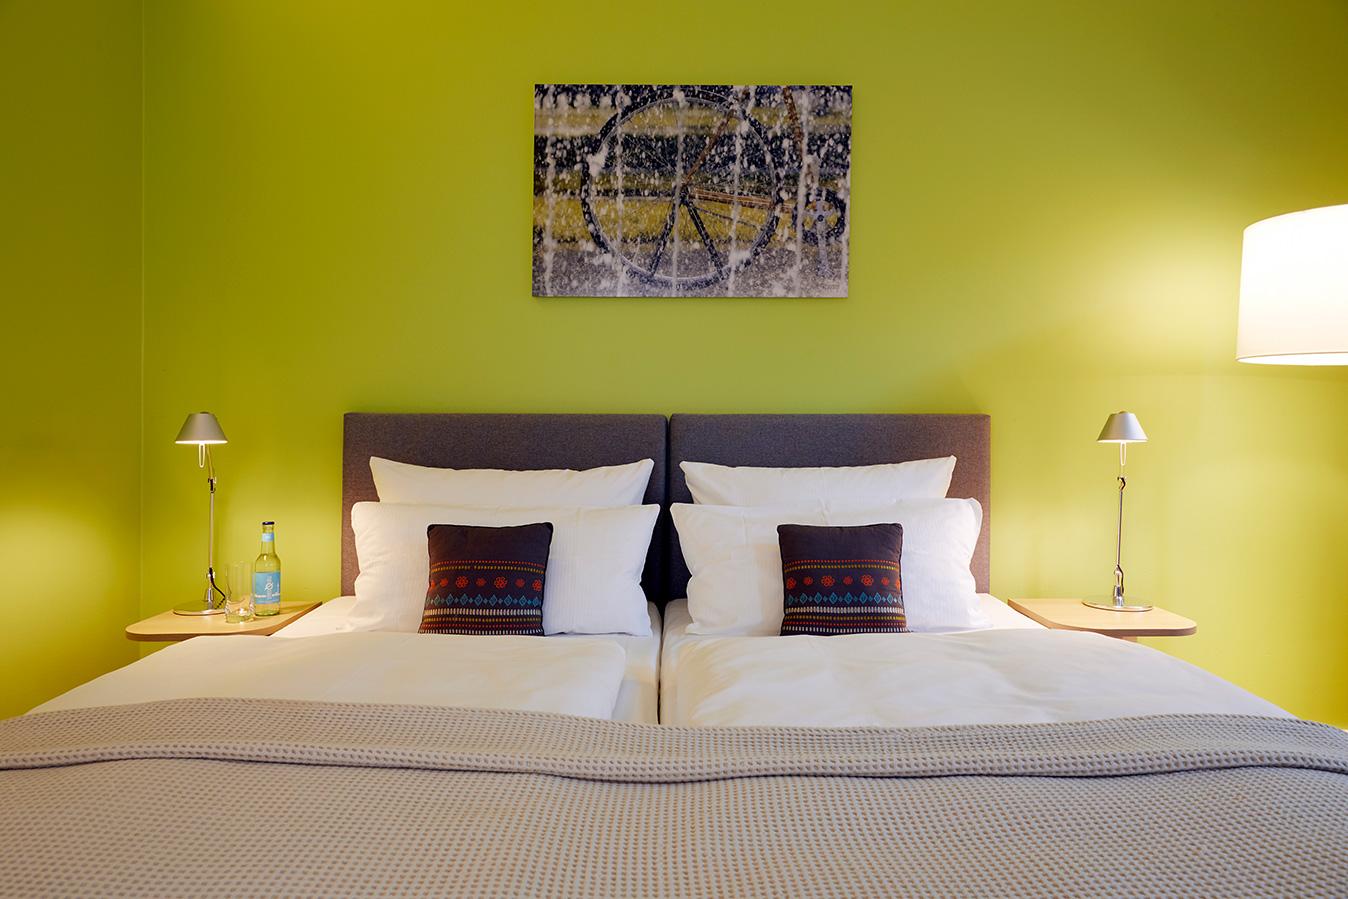 FLOTTWELL BERLIN Hotel - Grünes Zimmer - 2. Etage